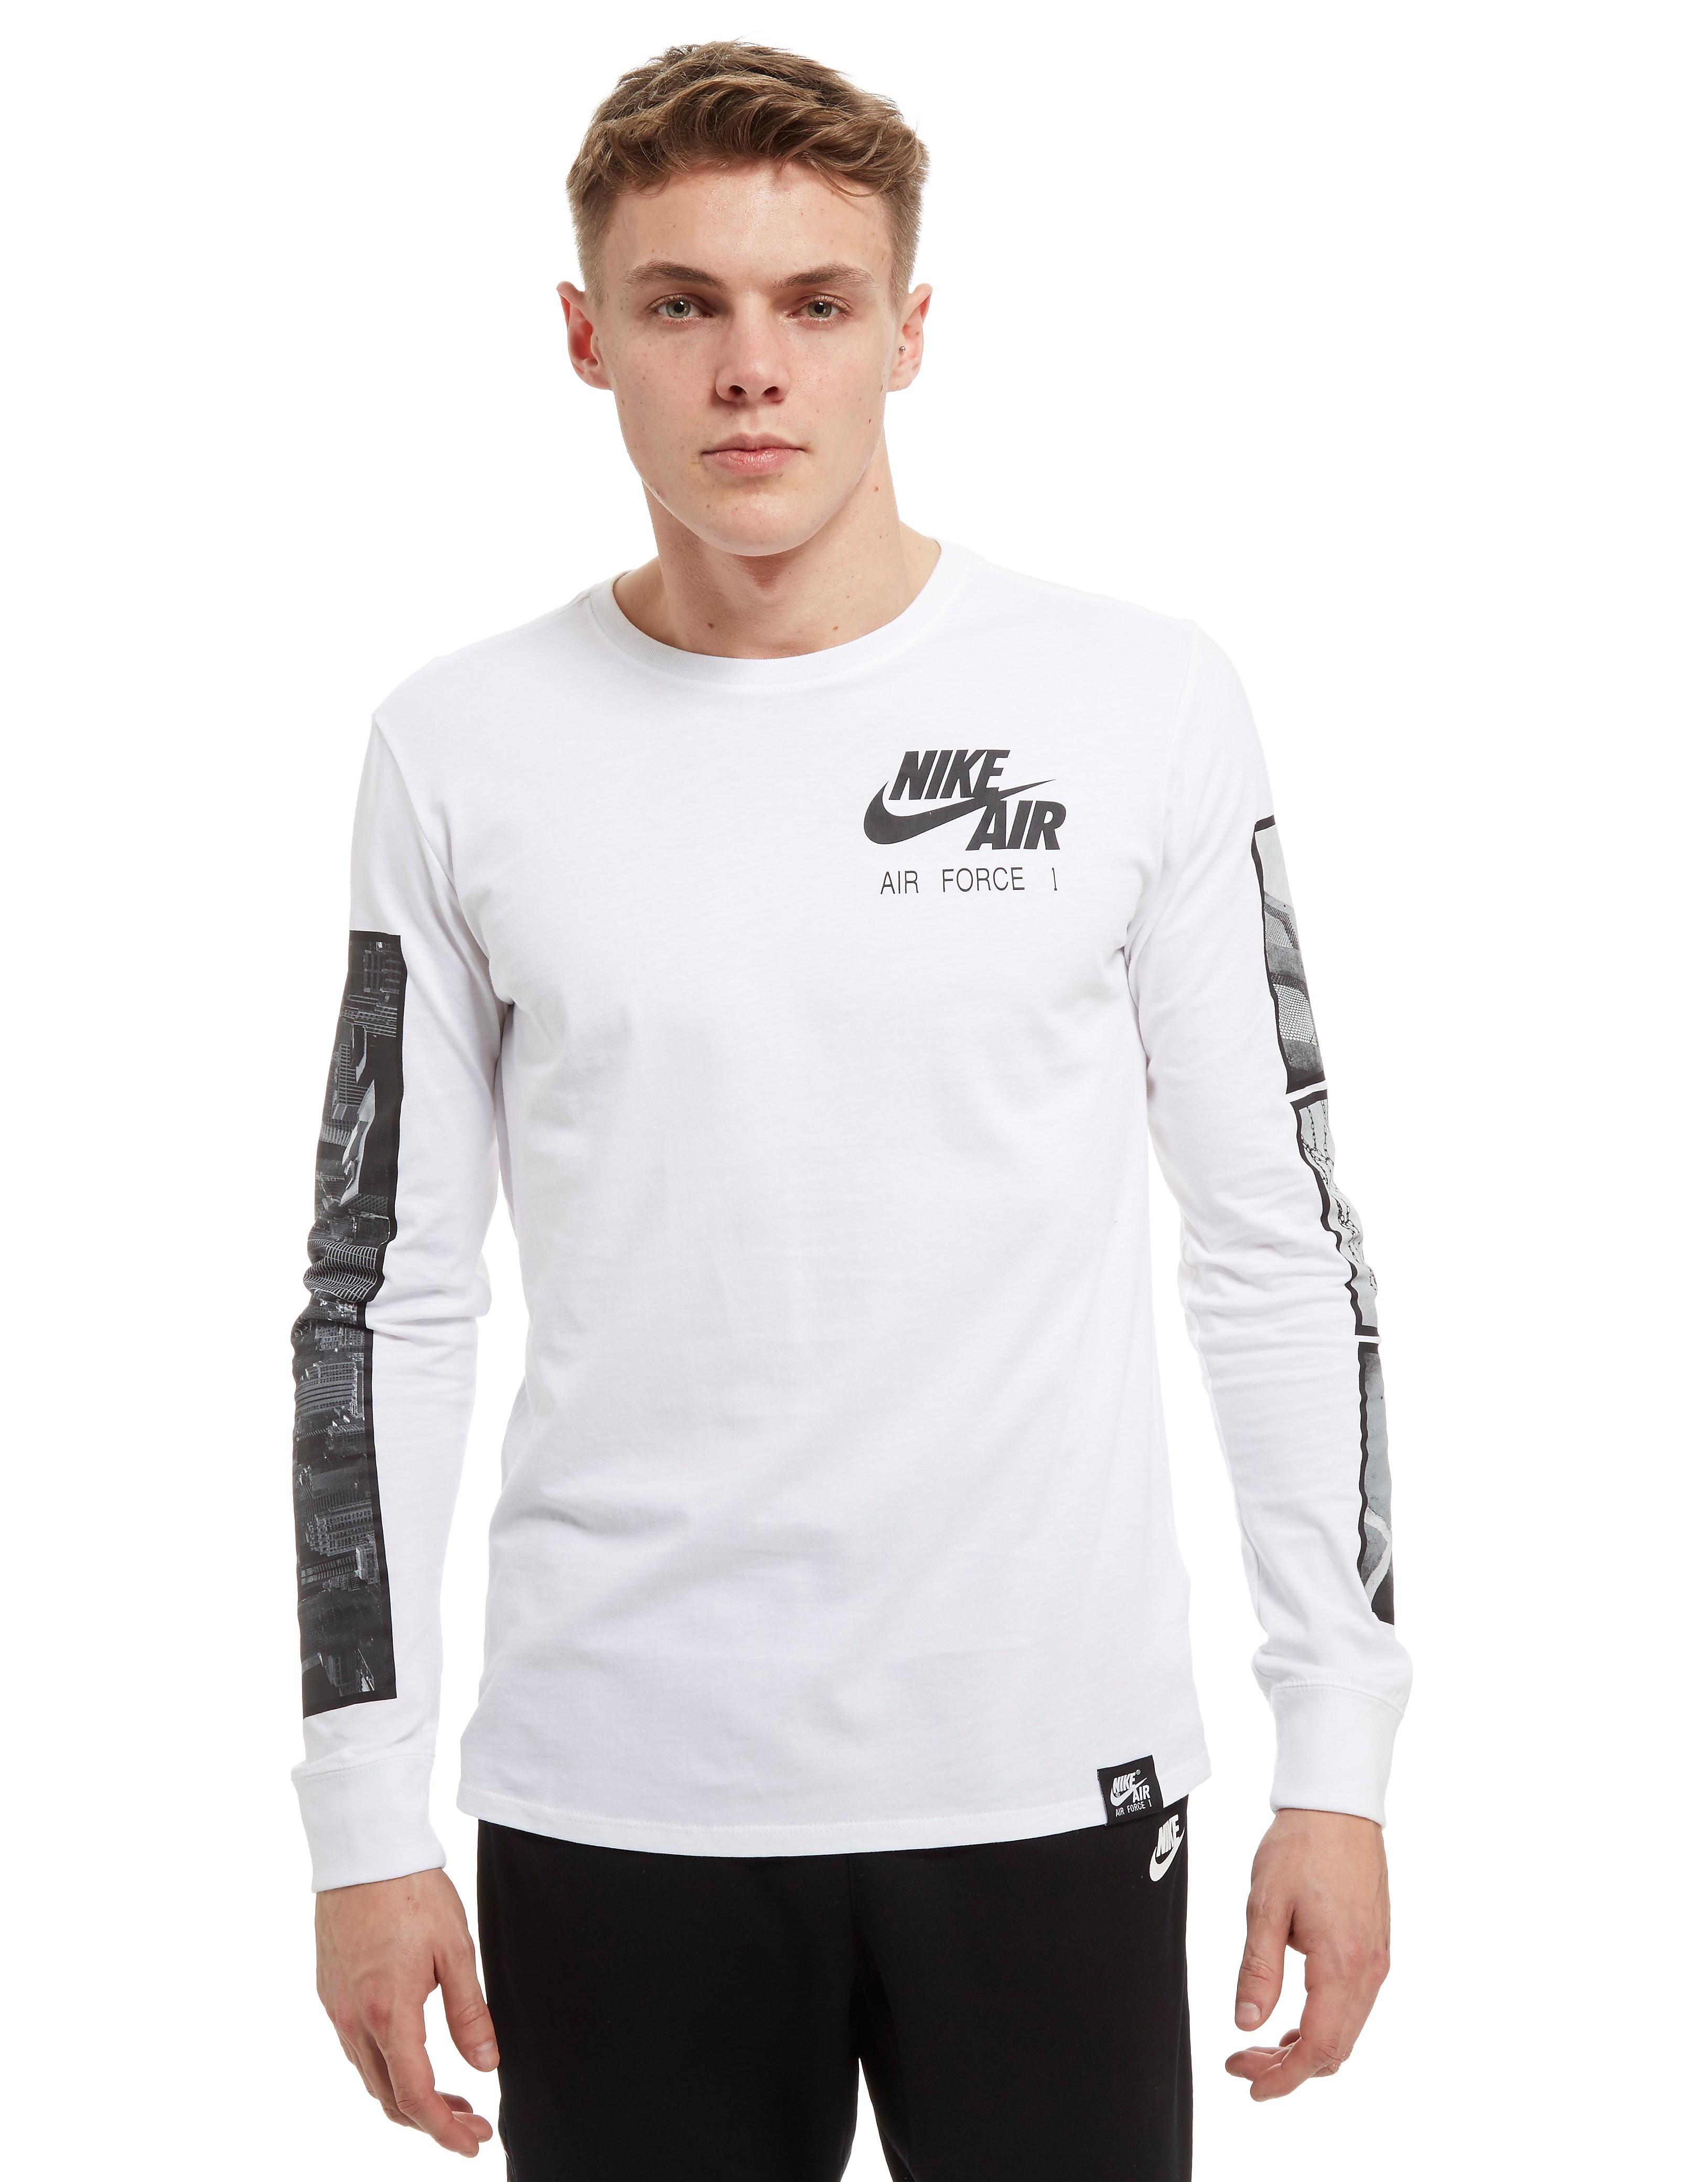 Nike Air Force 1 Foto Langarm T-Shirt